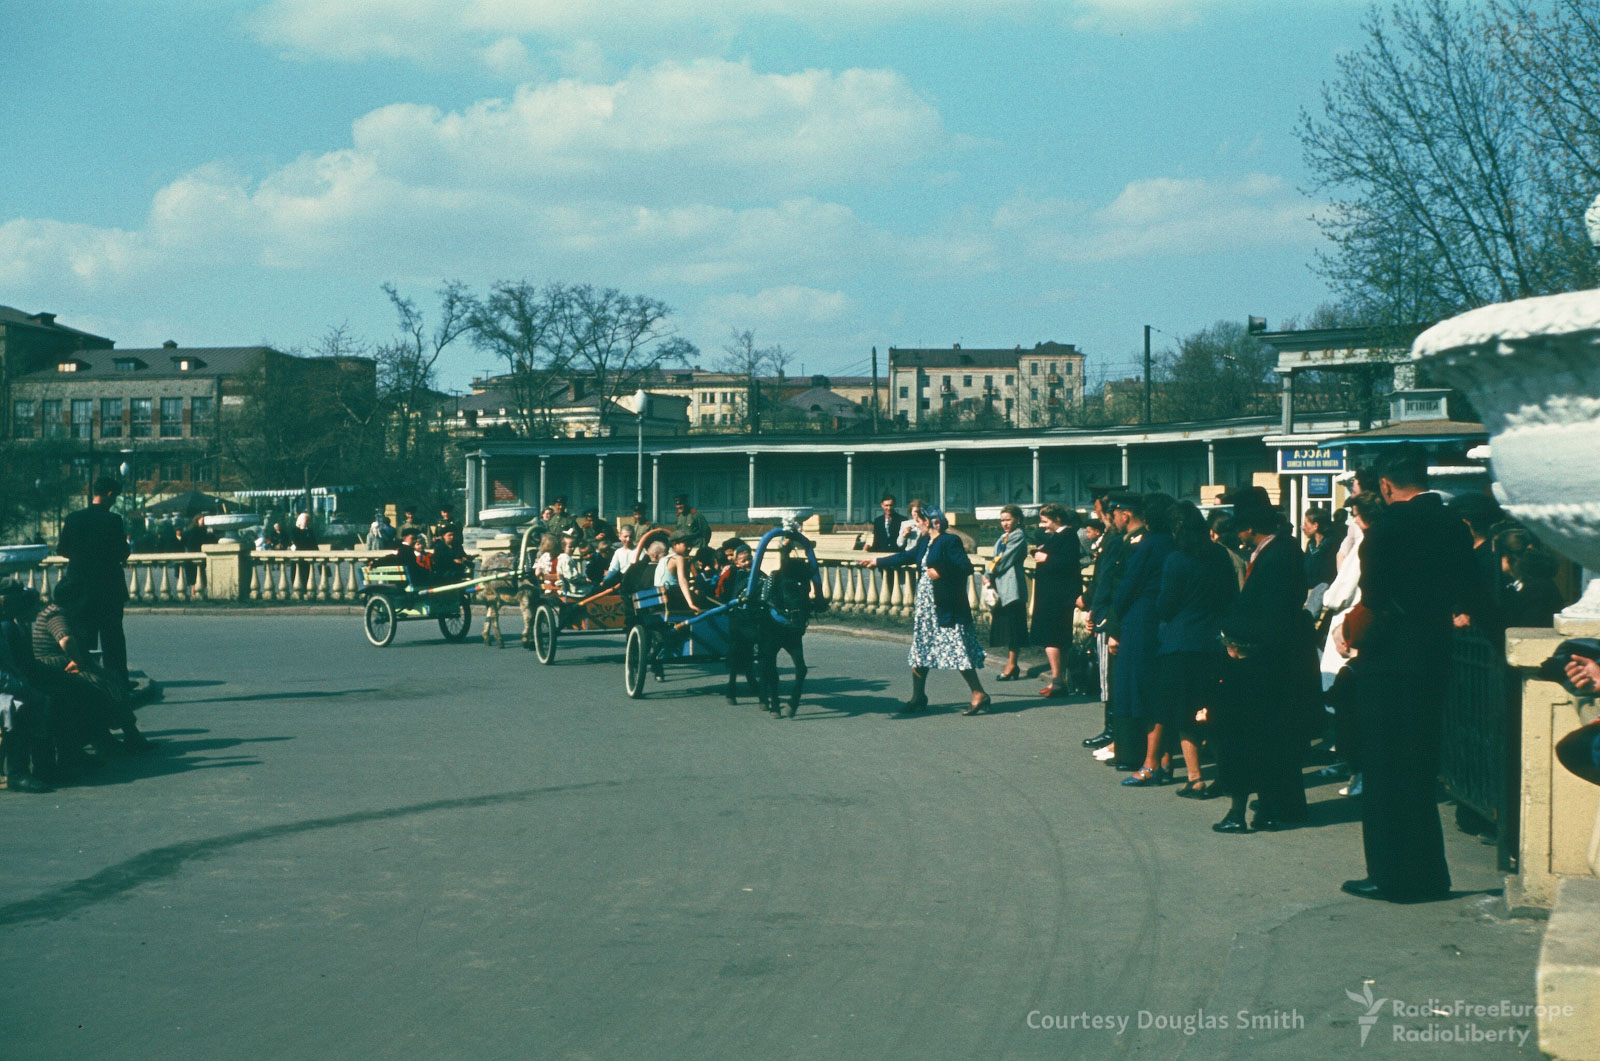 Московский зоопарк. Прогулка на пони